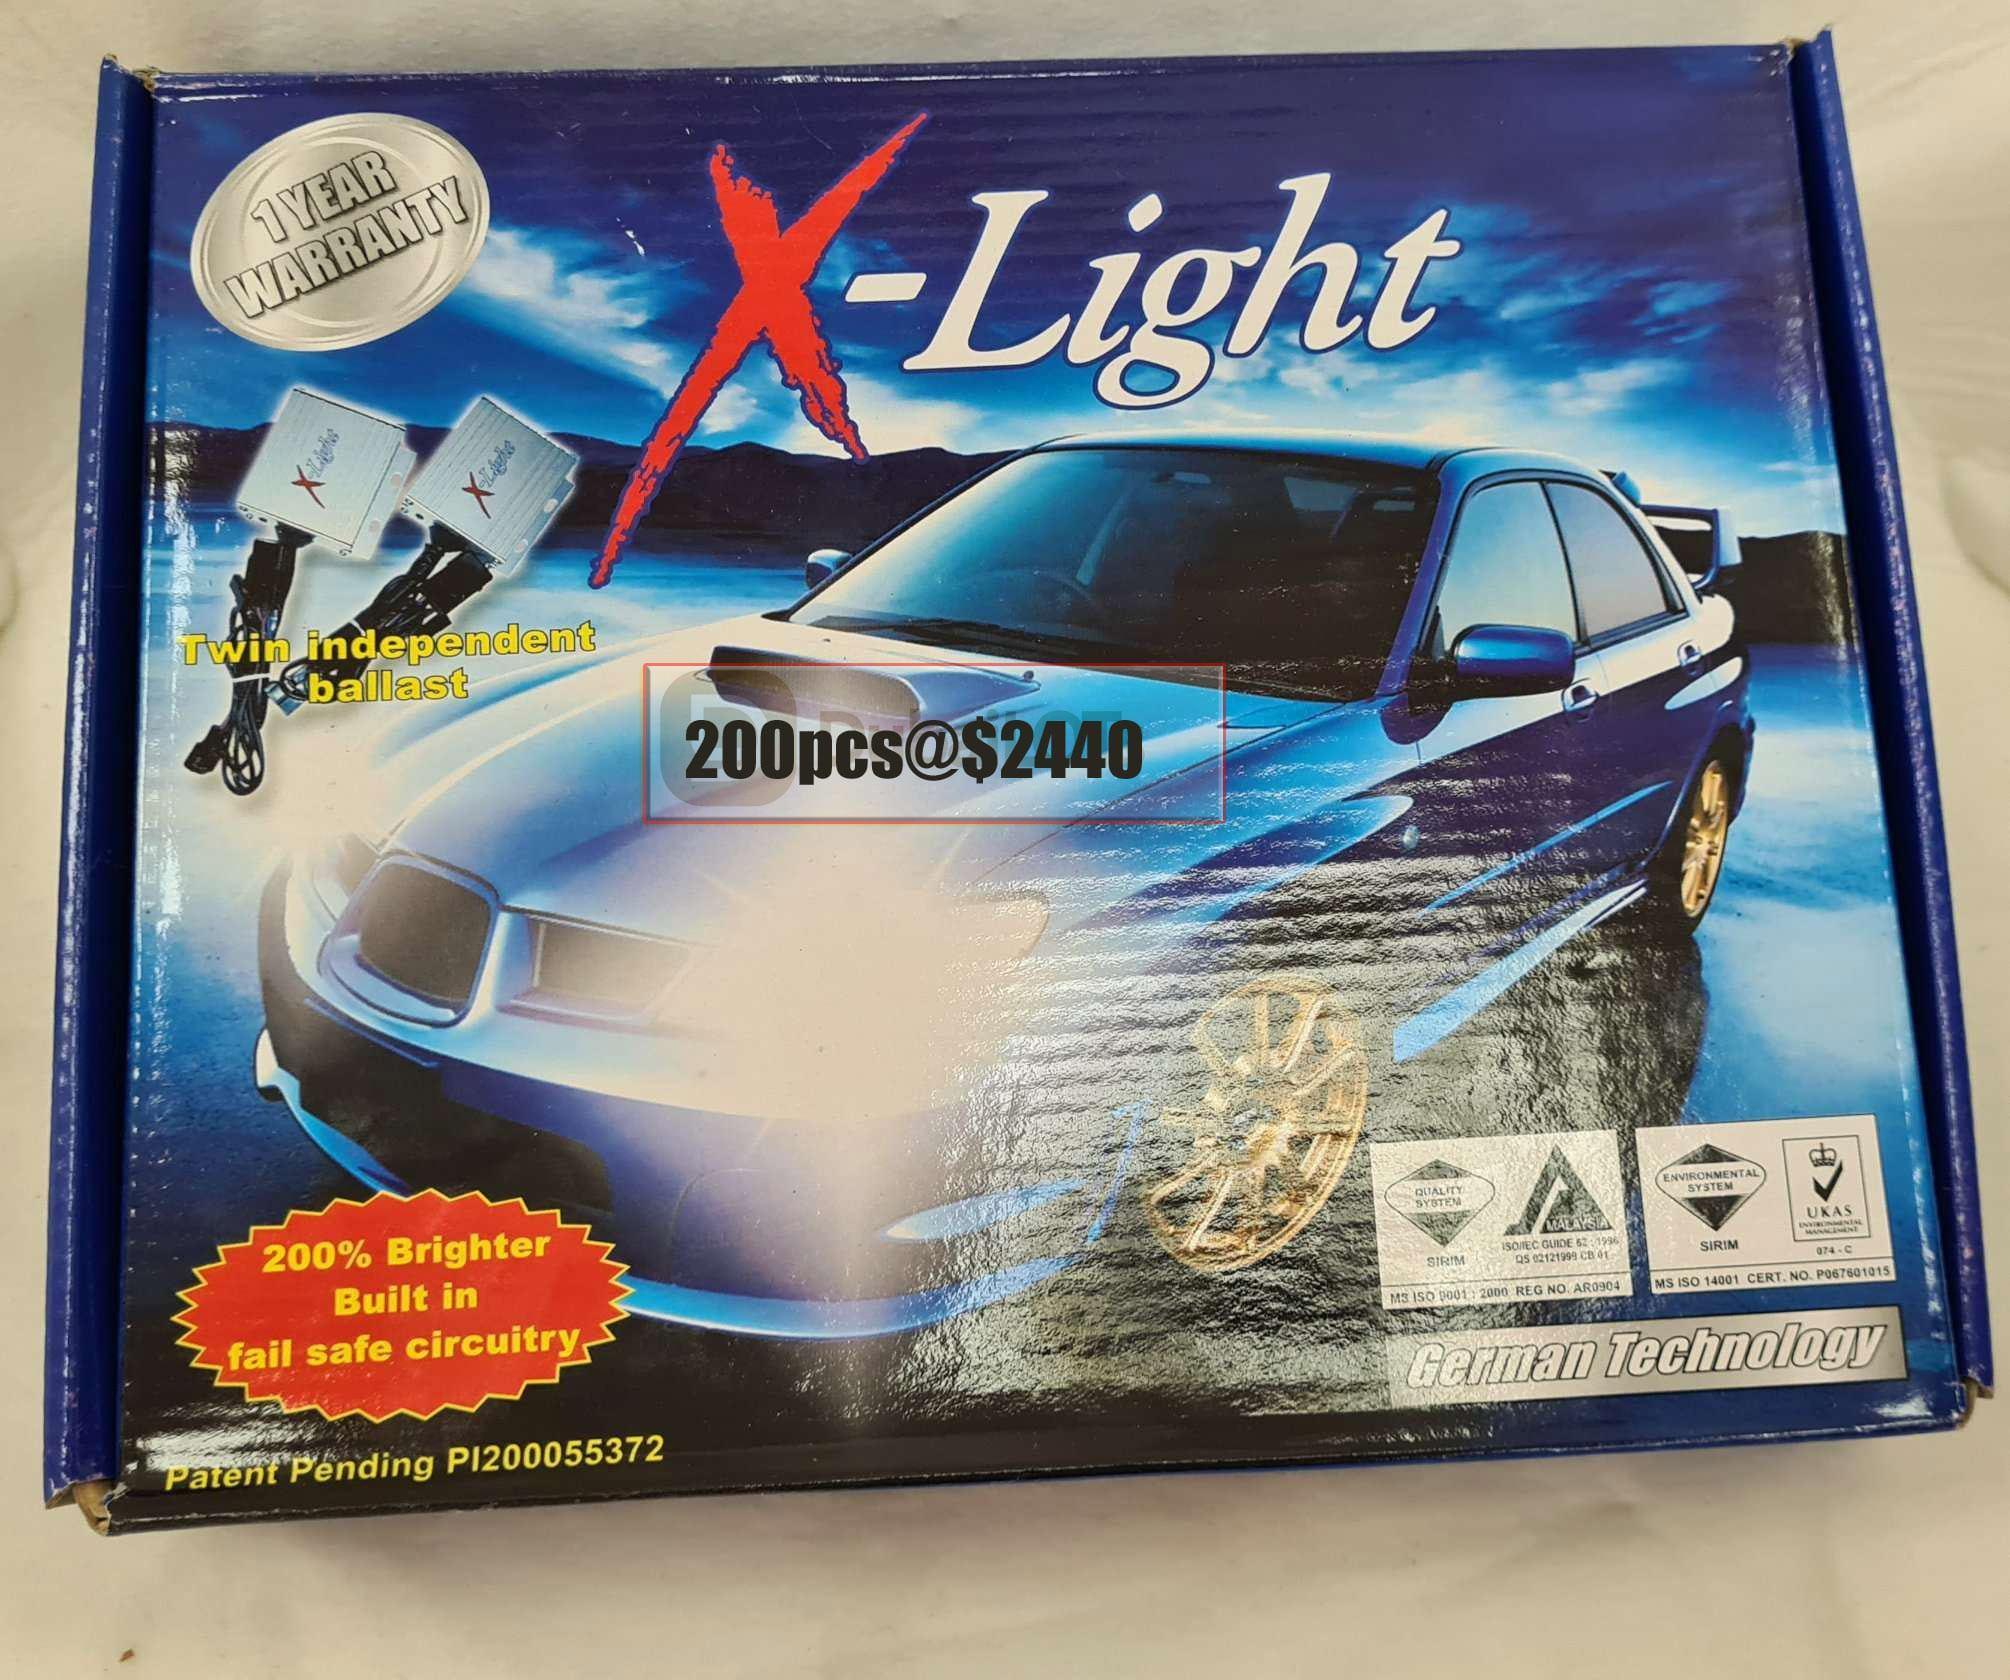 X-light automotive lighting system